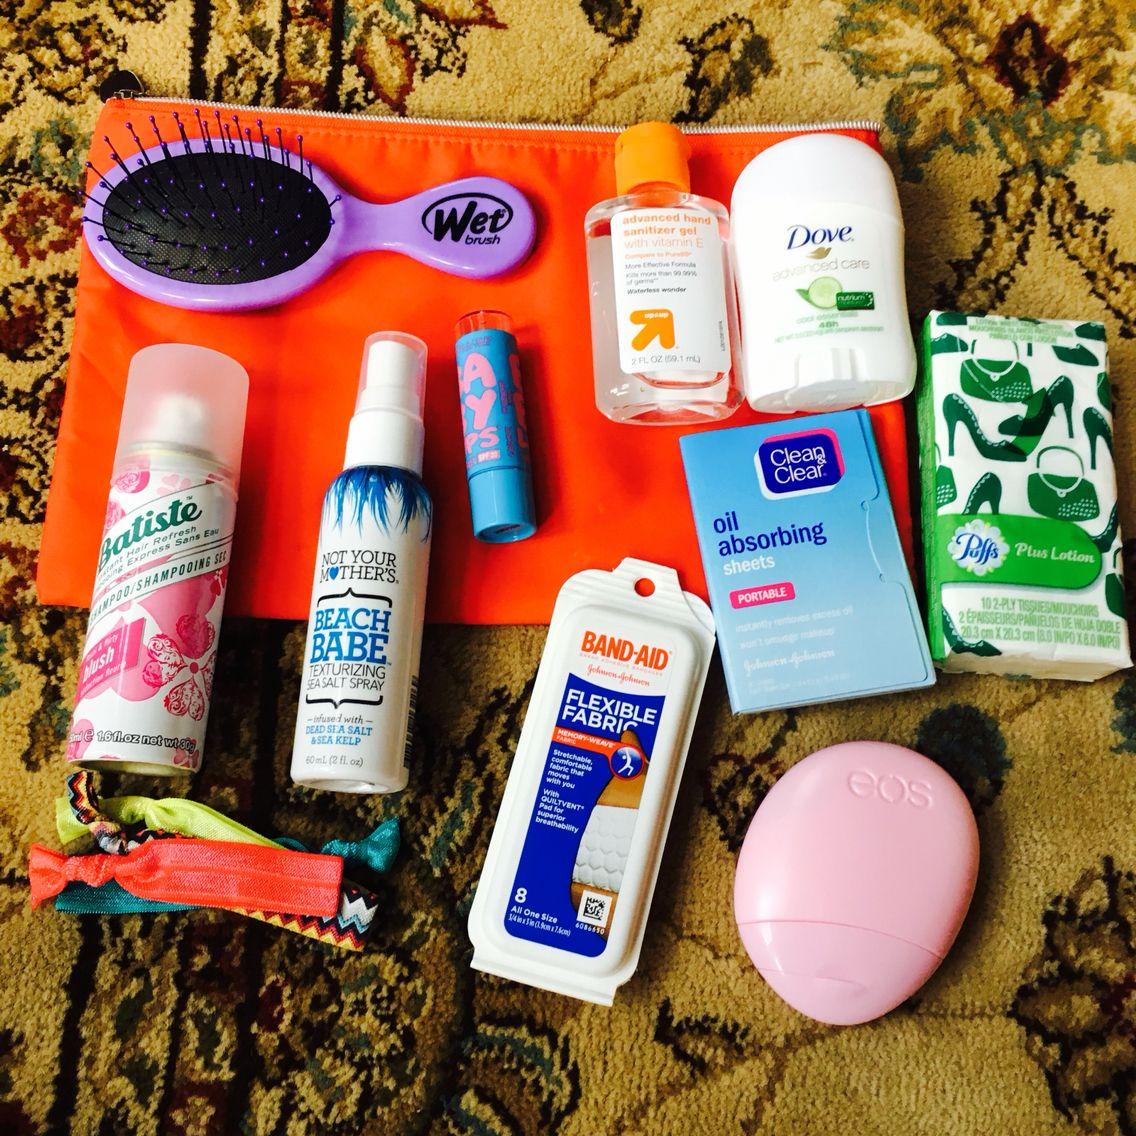 La Beauty Travel Kit Post By Mininekomtl Talks About X3clean